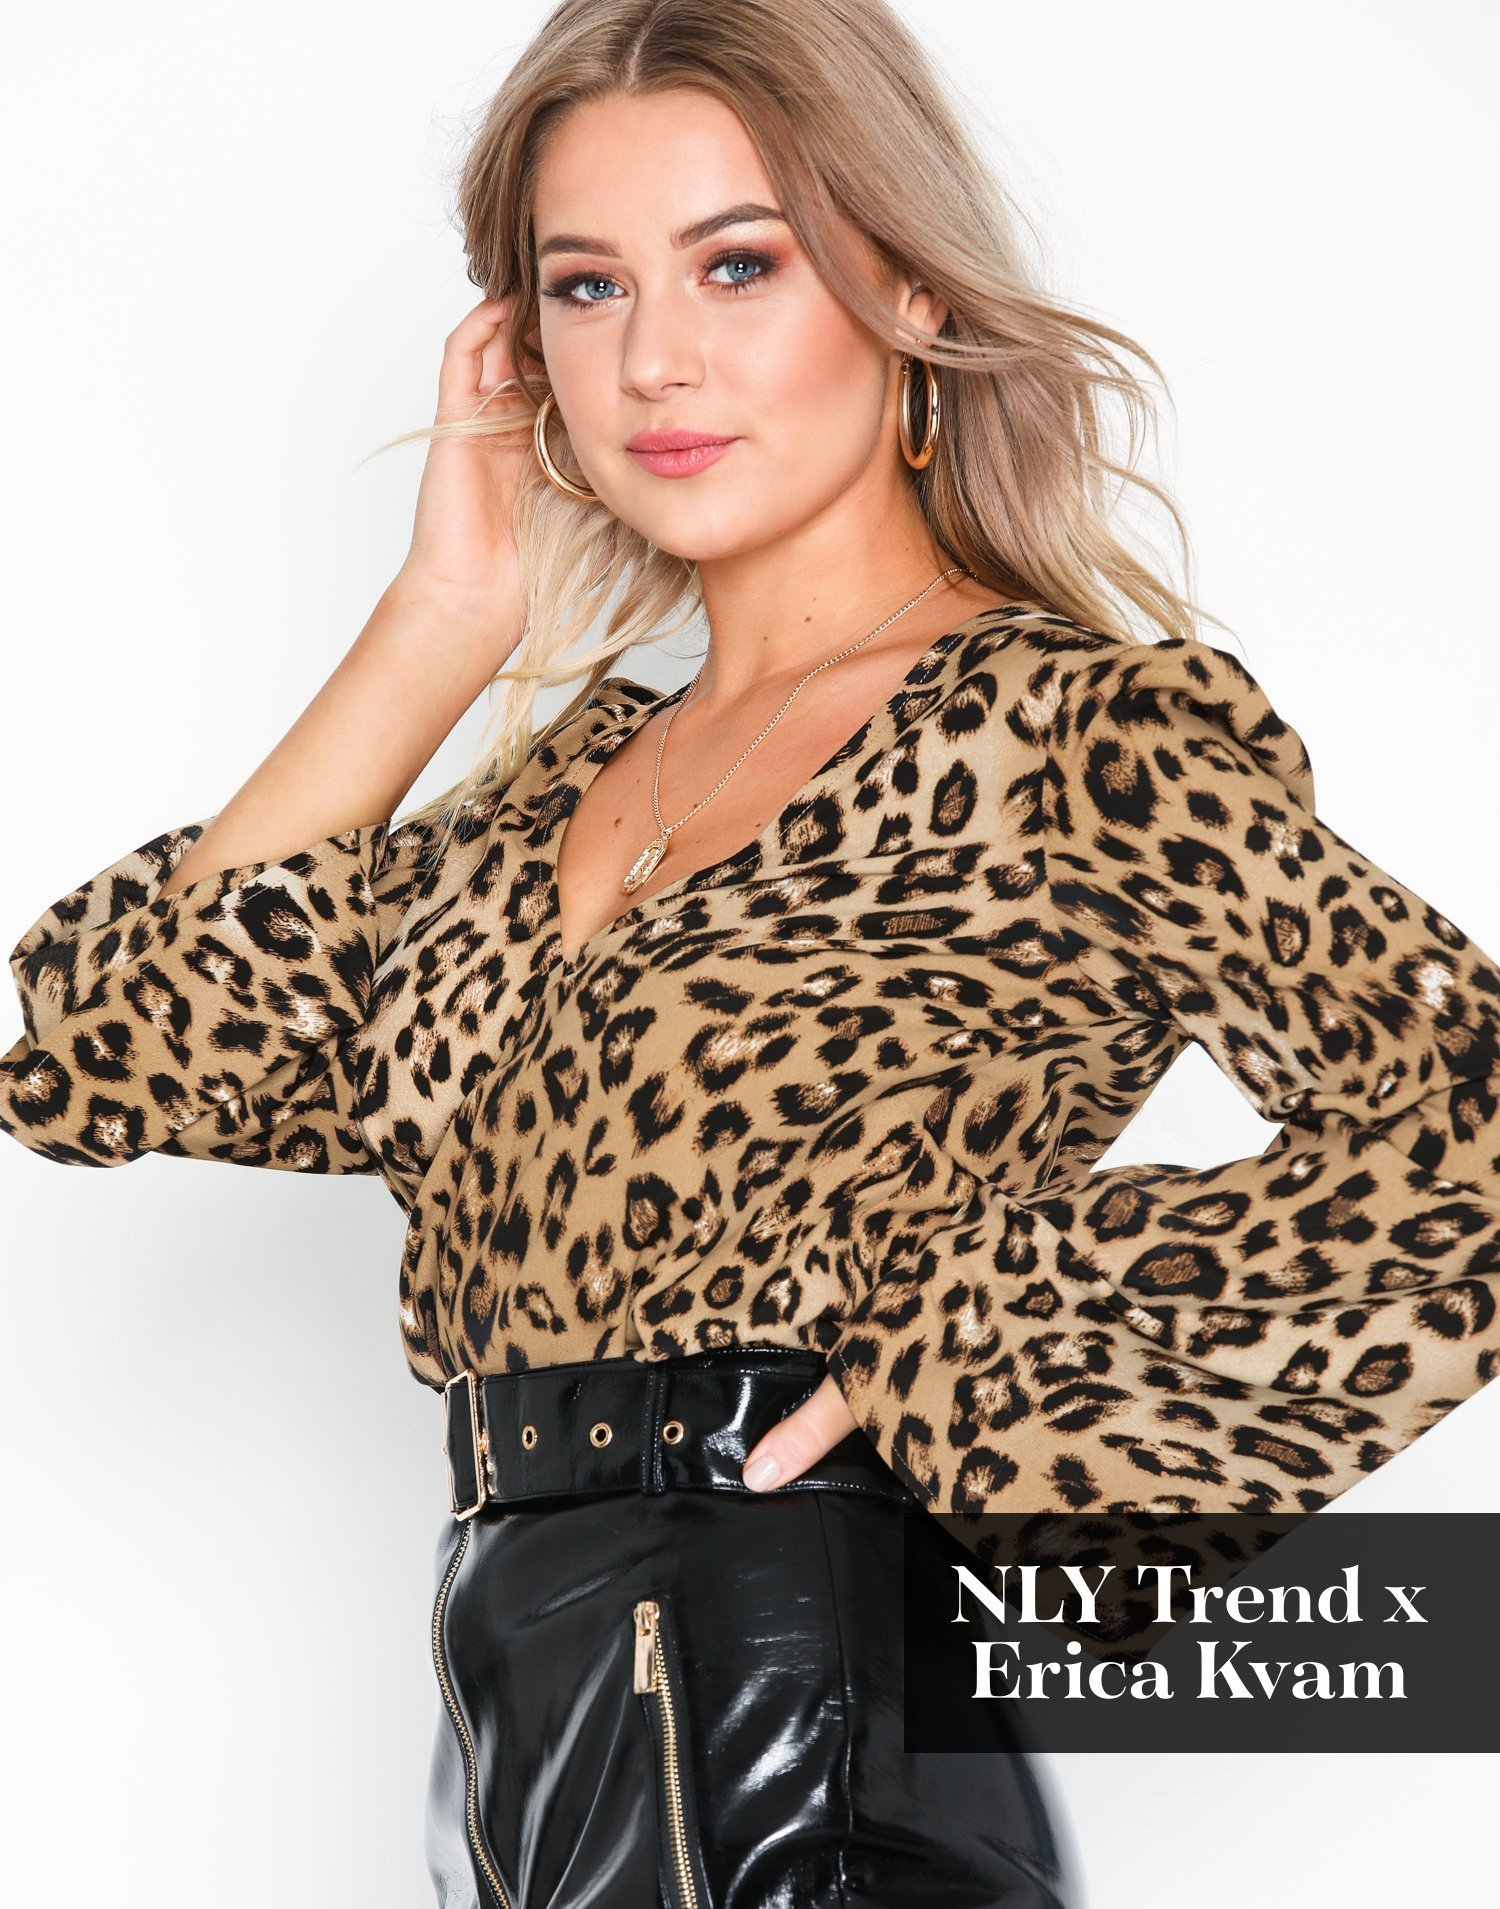 Nly Kvinde Leo Tøj Bluseramp; Skjorter Trend Blouse bWDHE2Ye9I